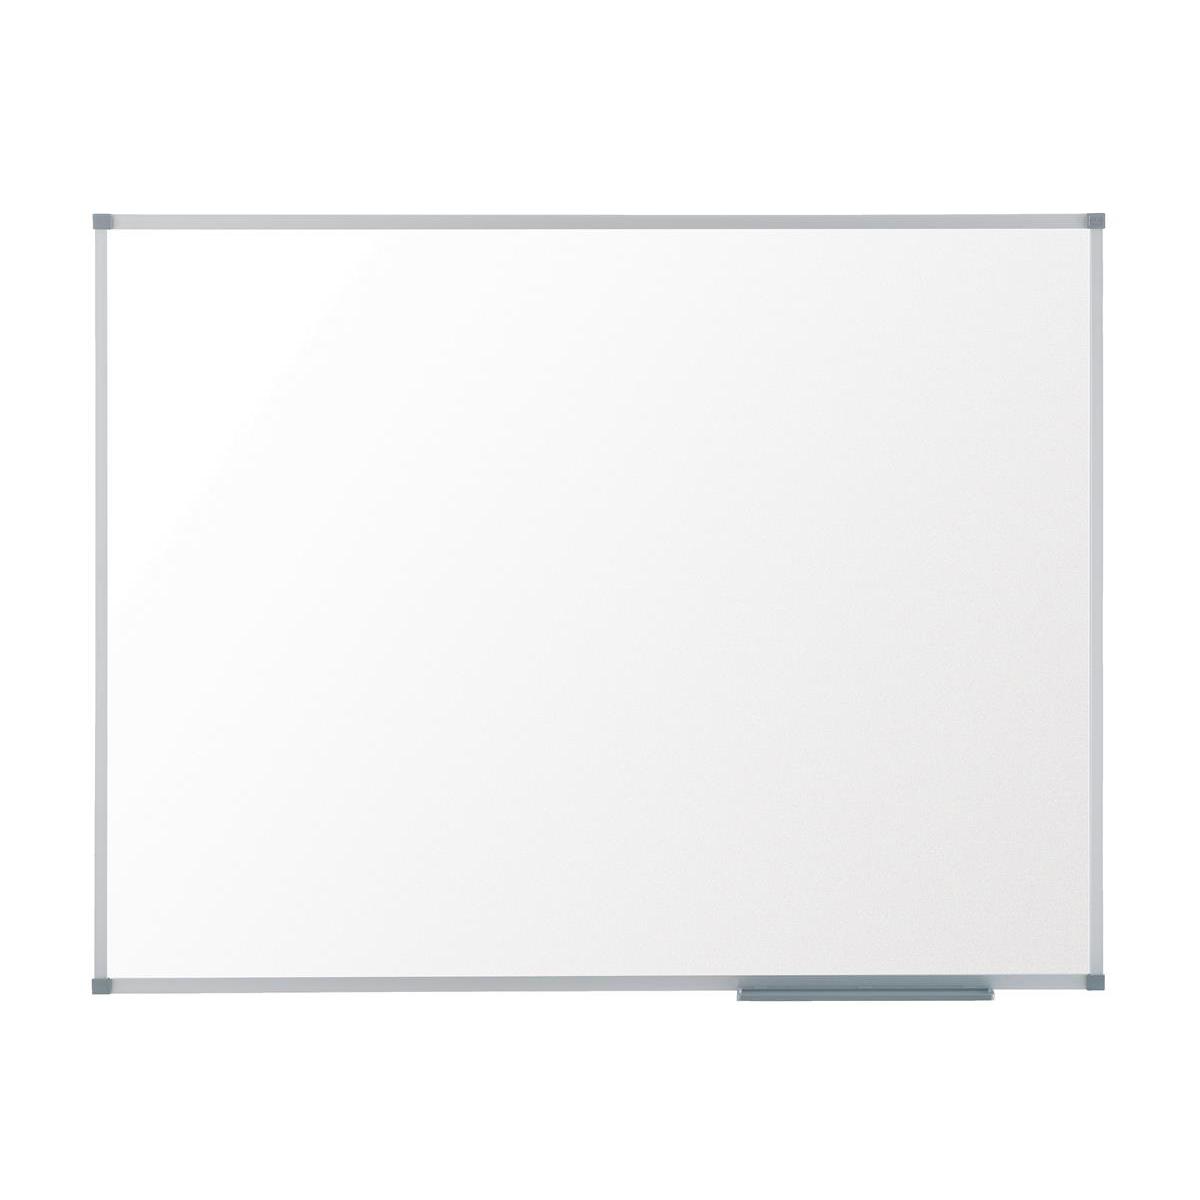 Nobo Basic Whiteboard Melamine Surface Non-magnetic Aluminium Trim W600xH450mm White Ref 1905201